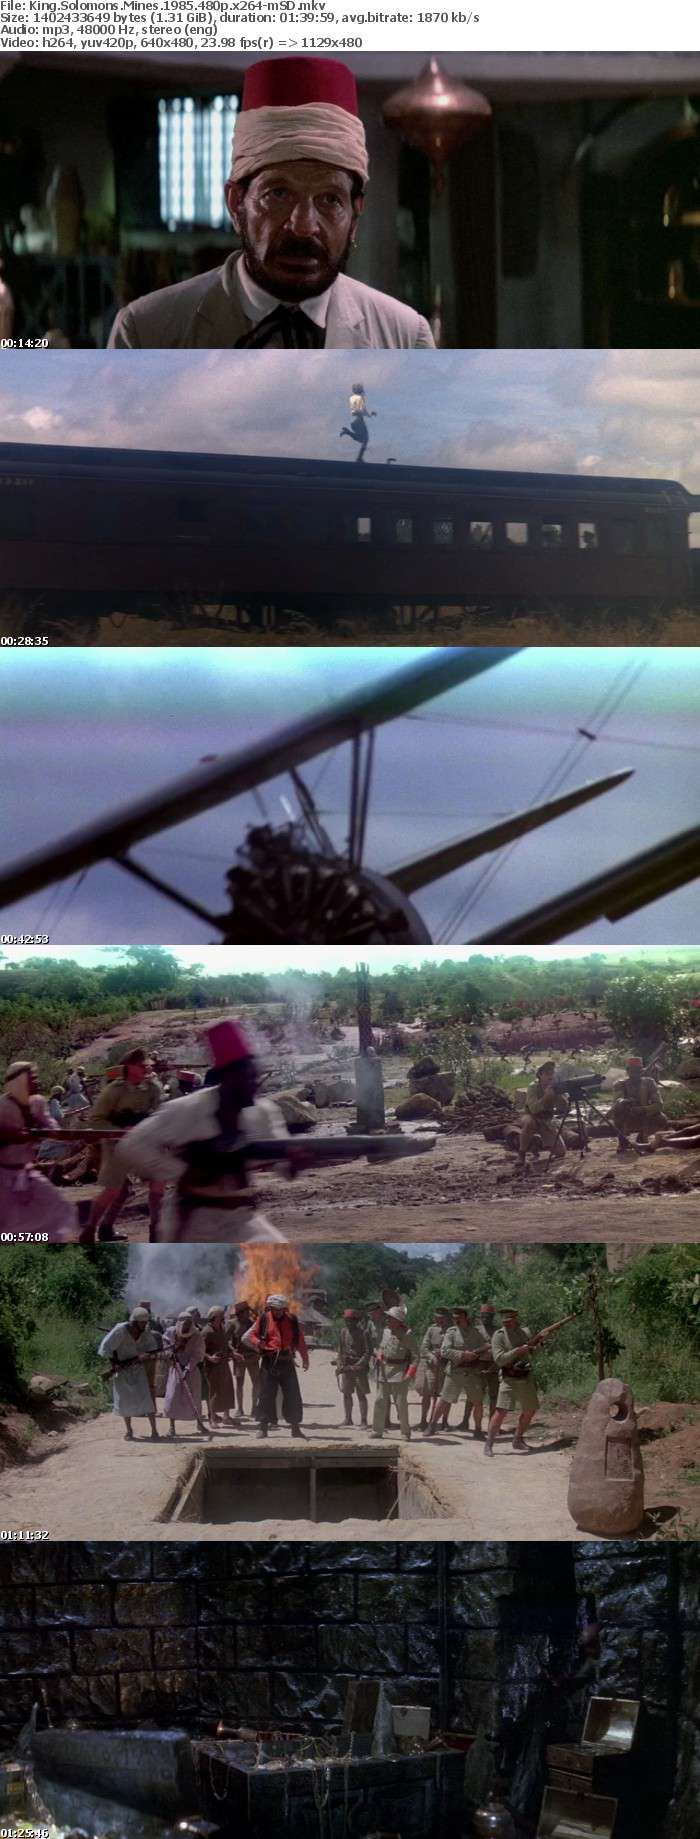 King Solomons Mines 1985 480p x264-mSD